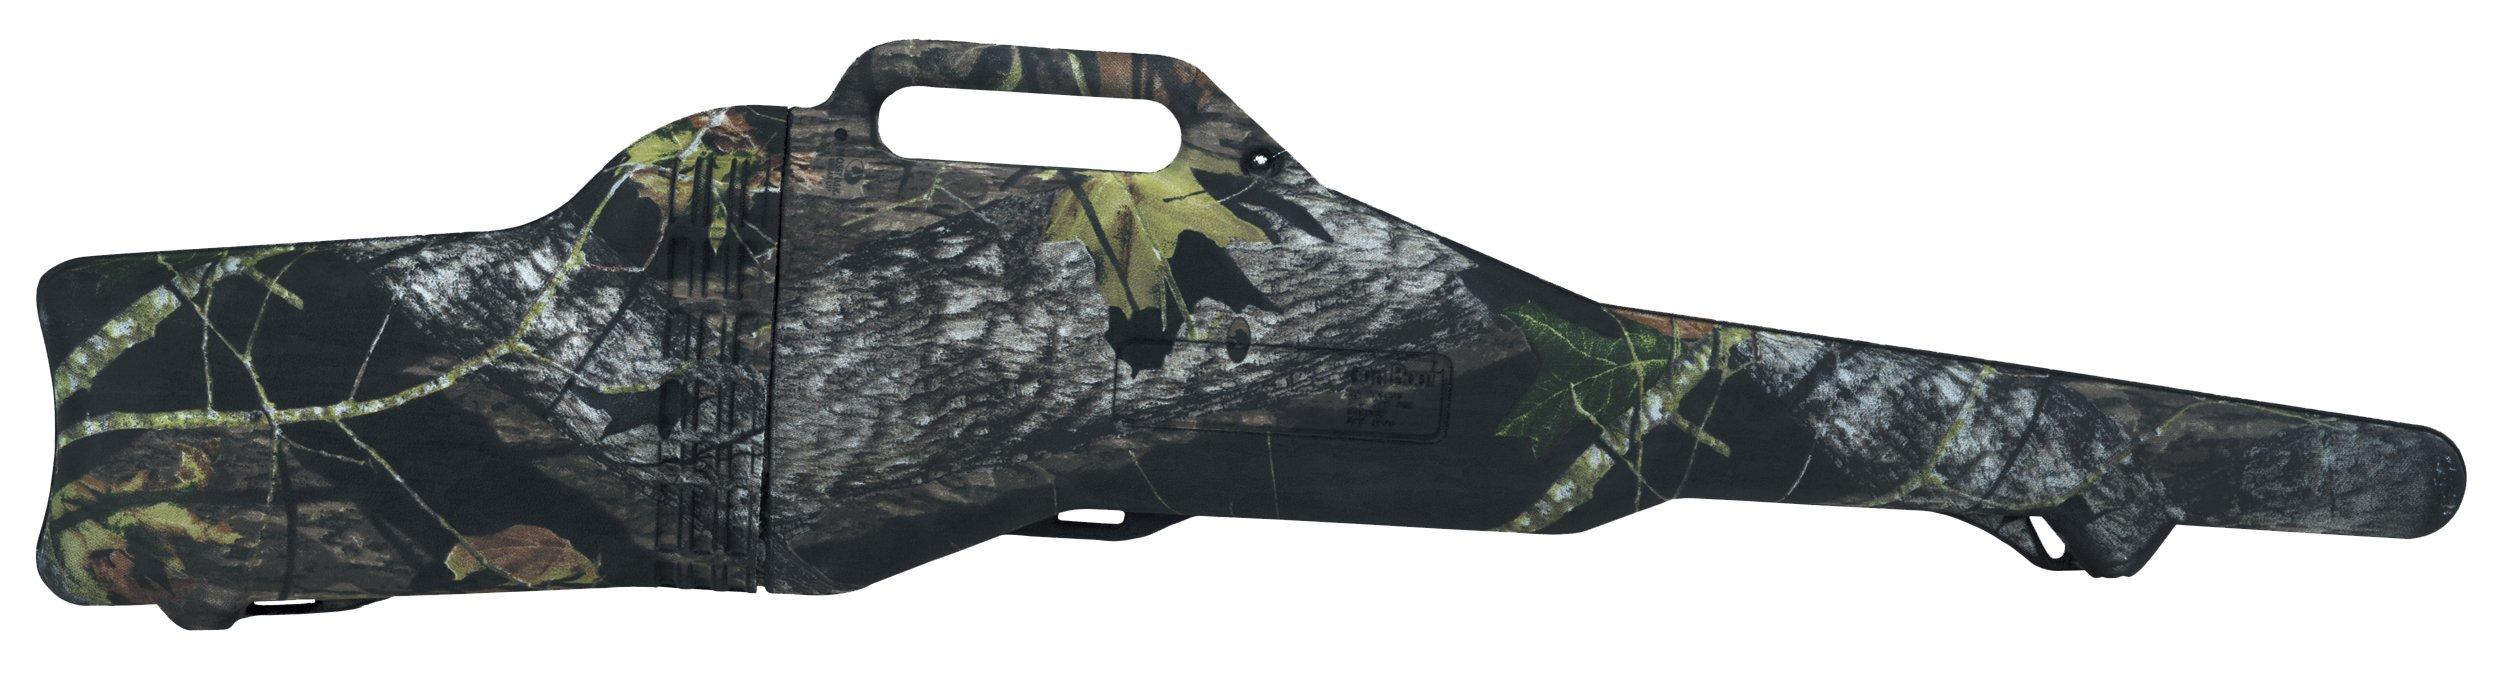 Kolpin Gun Boot 4 Mossy Oak Camo Hard Case - 20061